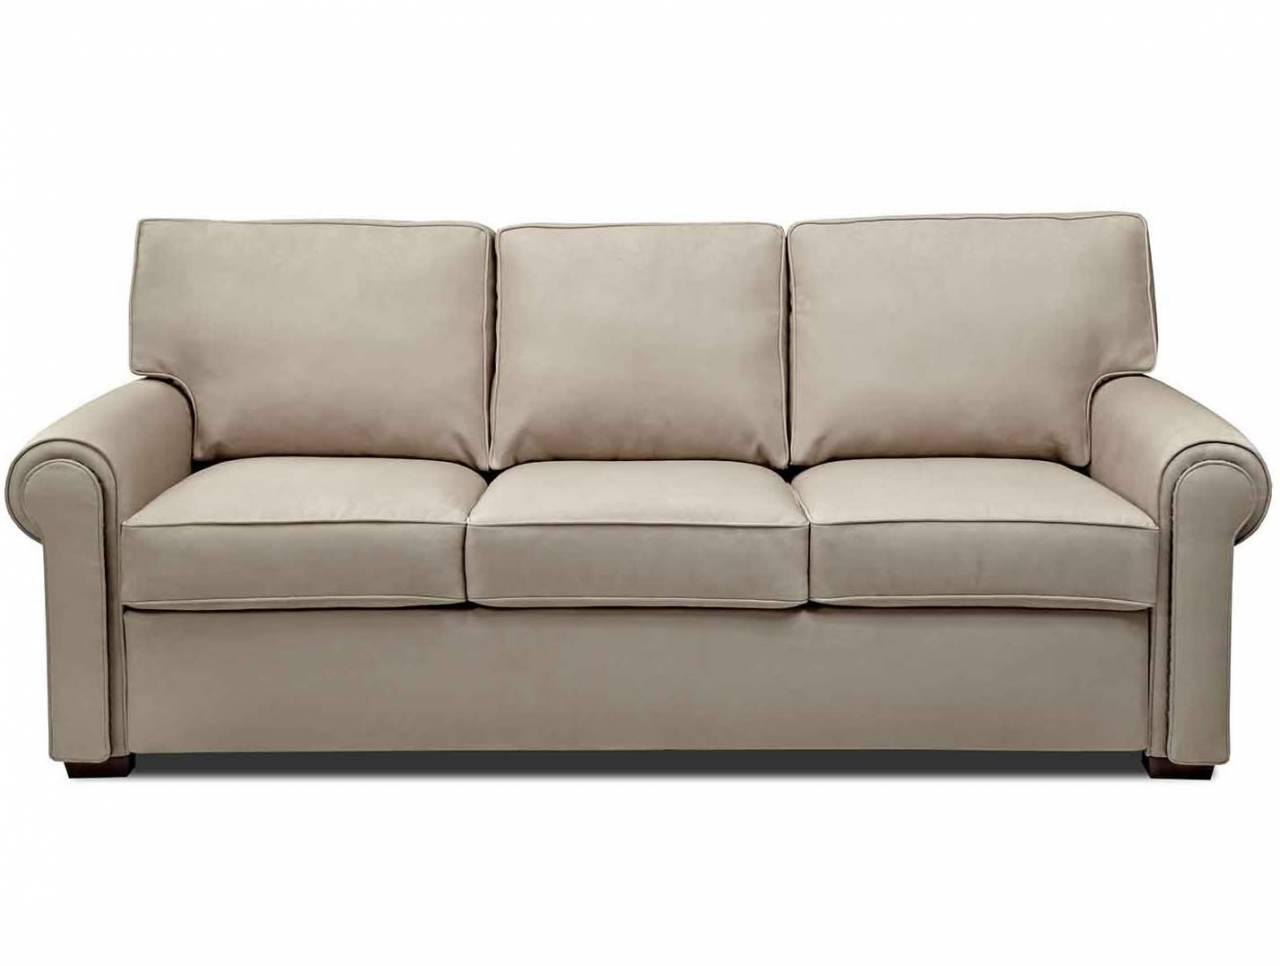 80 Sofas Inches Under